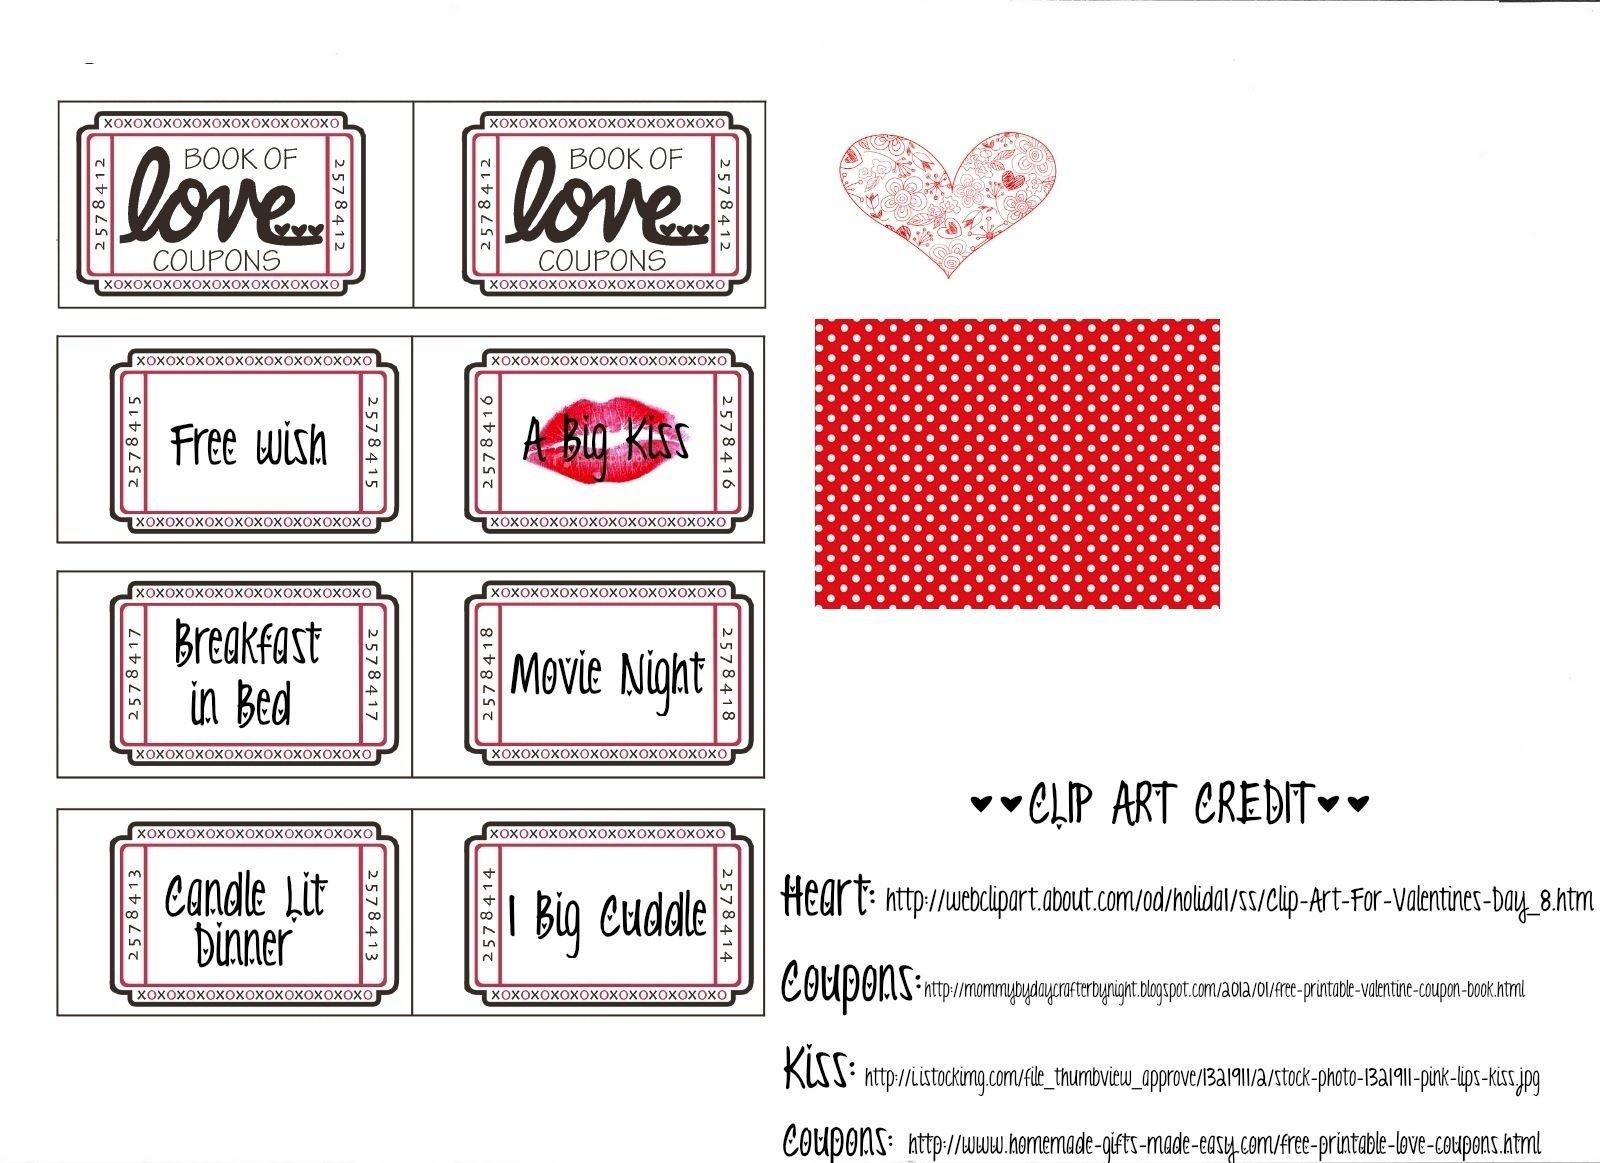 10 Unique Coupon Book Ideas For Husband boyfriend coupon book ideas valentines day pinterest diy 2 2021